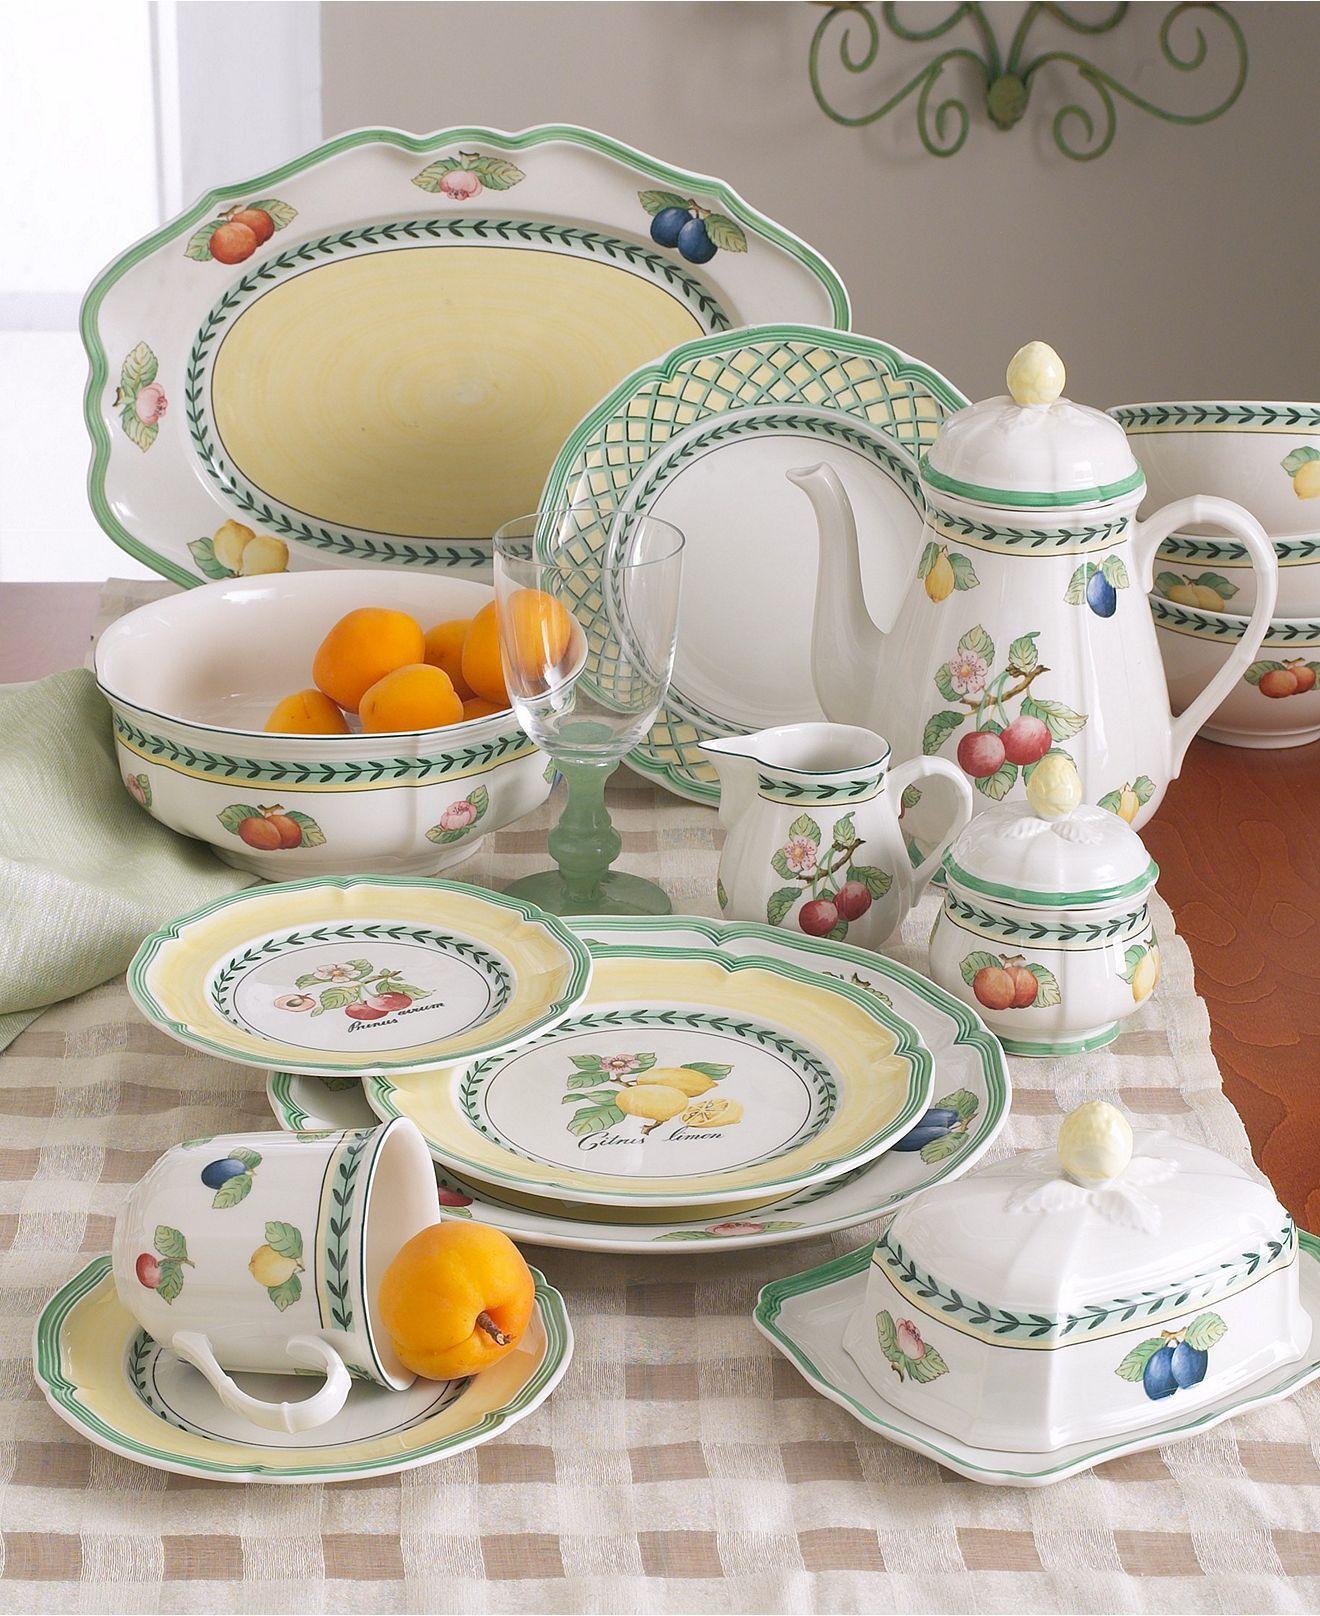 villeroy boch dinnerware french garden dinner plate vajillas porcelana y vajillas para cena. Black Bedroom Furniture Sets. Home Design Ideas